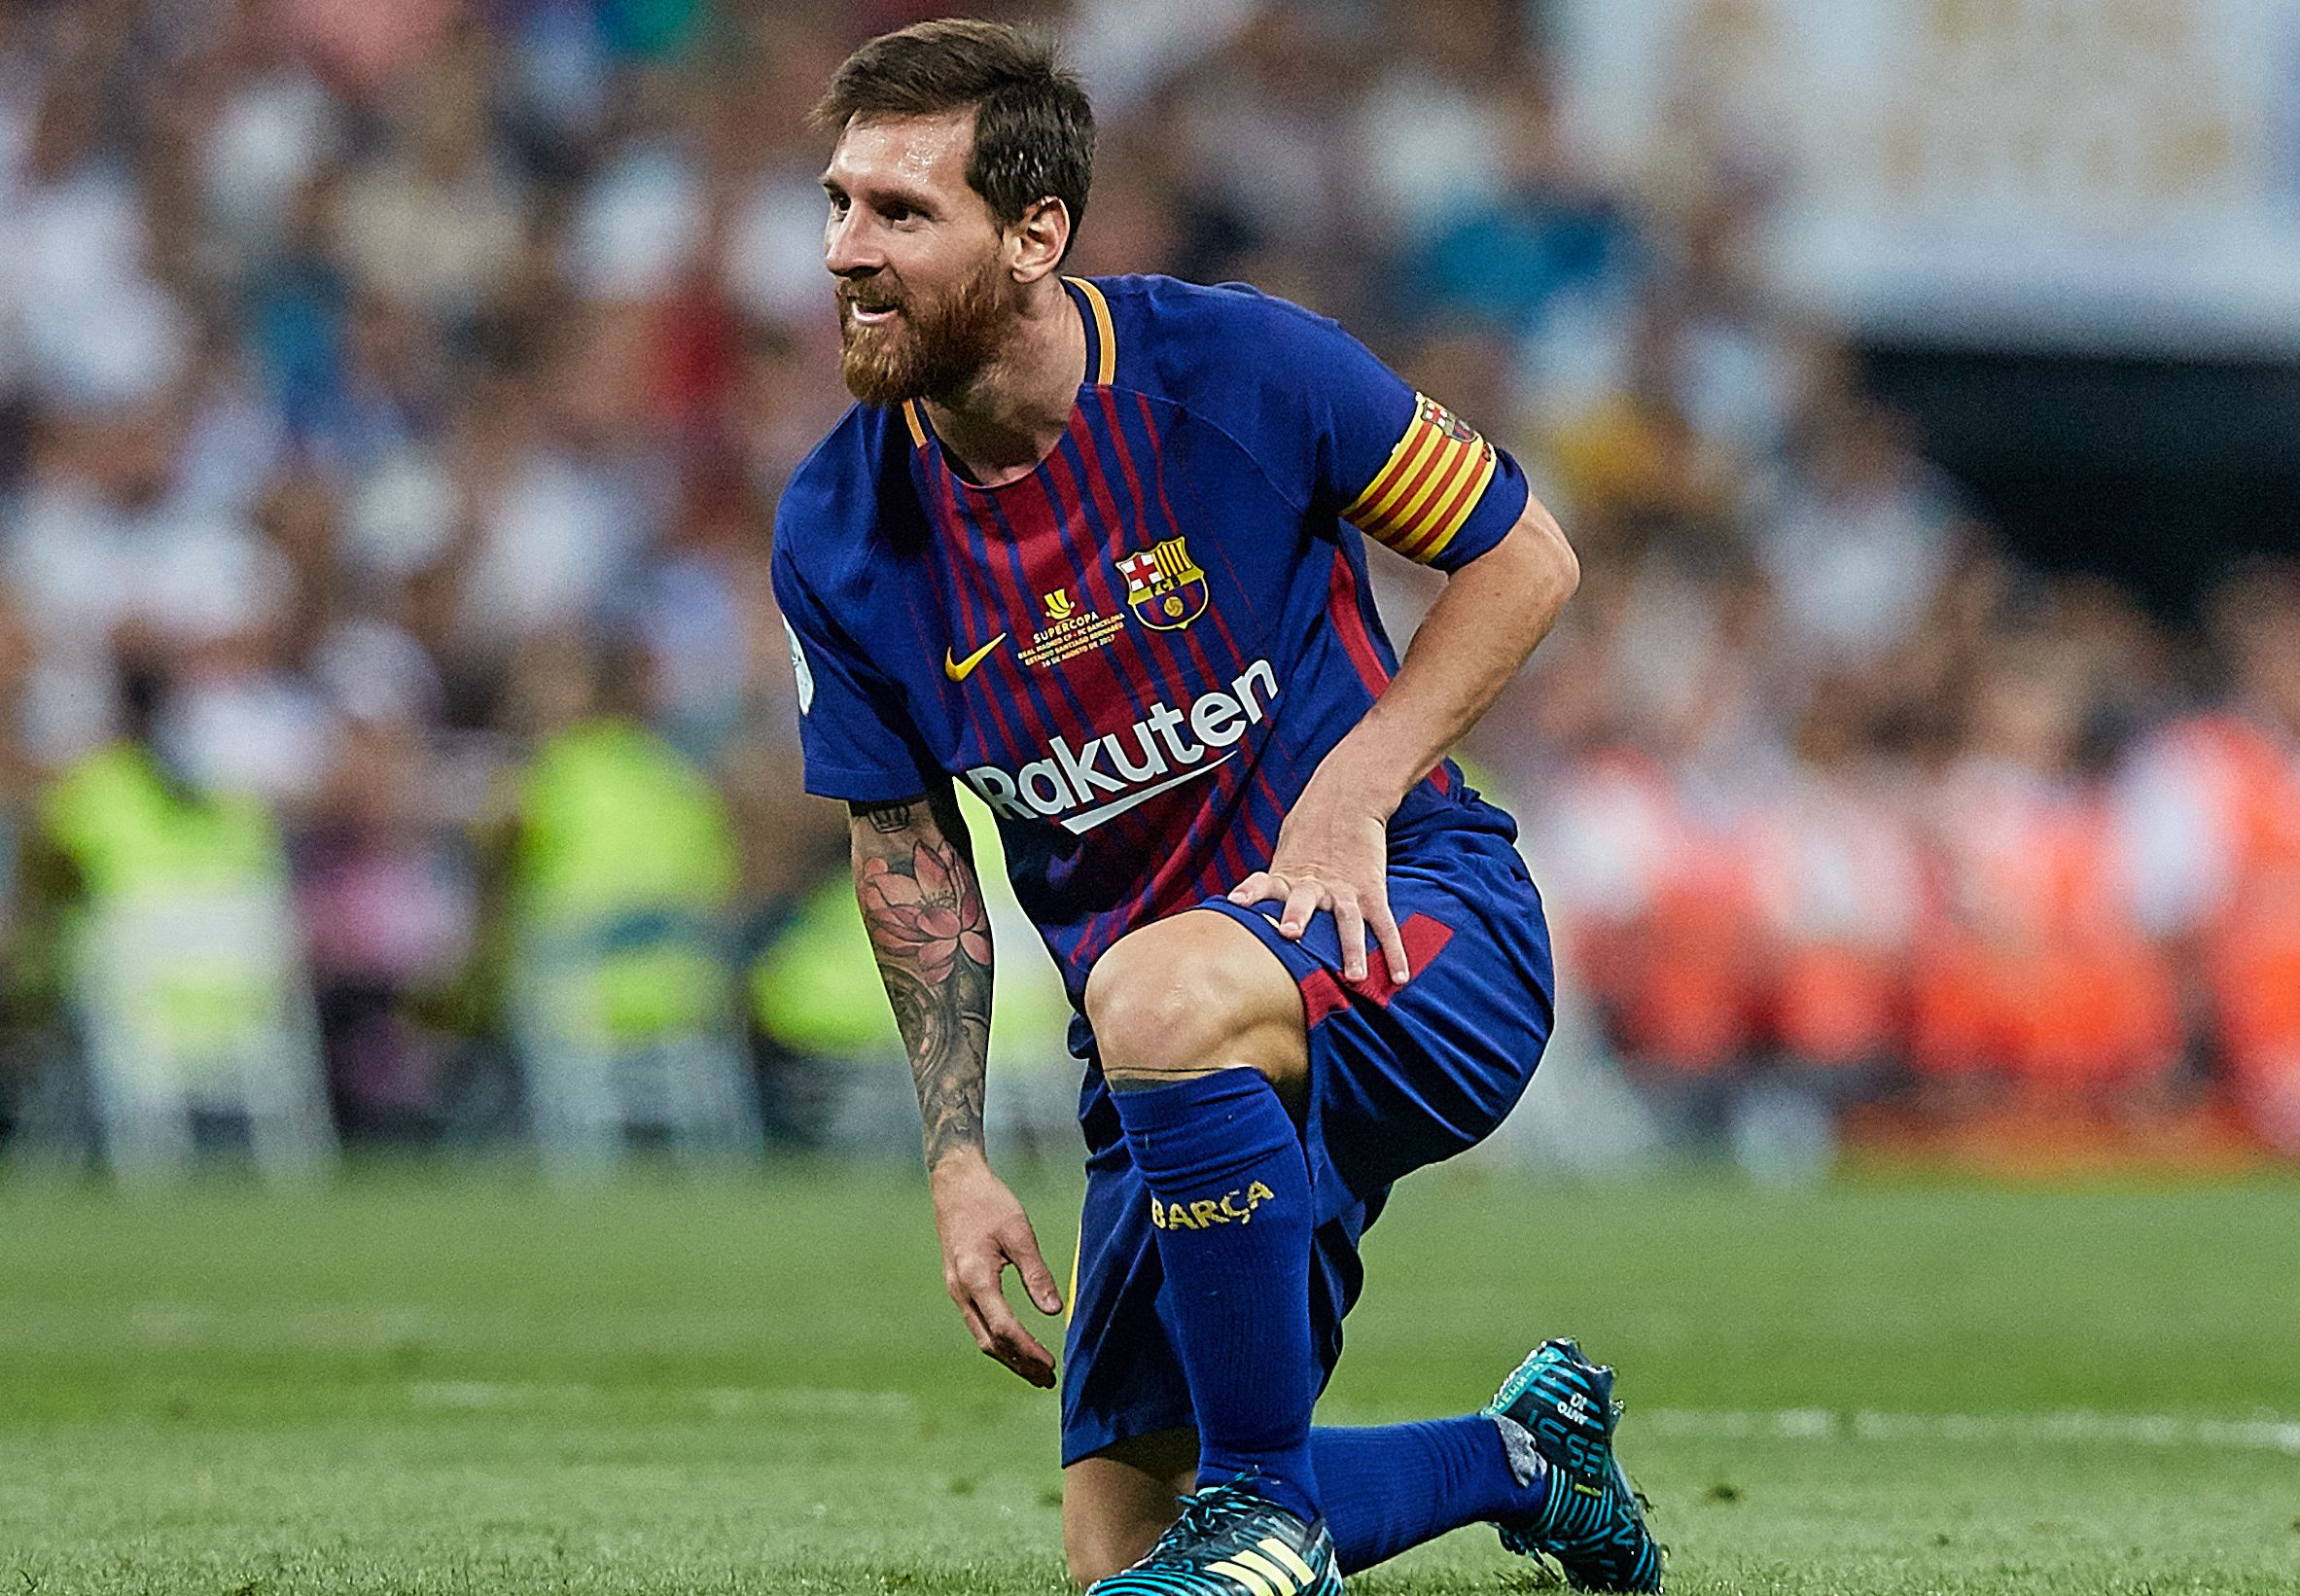 Football - Transferts - Après Neymar, le Barça peut-il perdre Messi ?